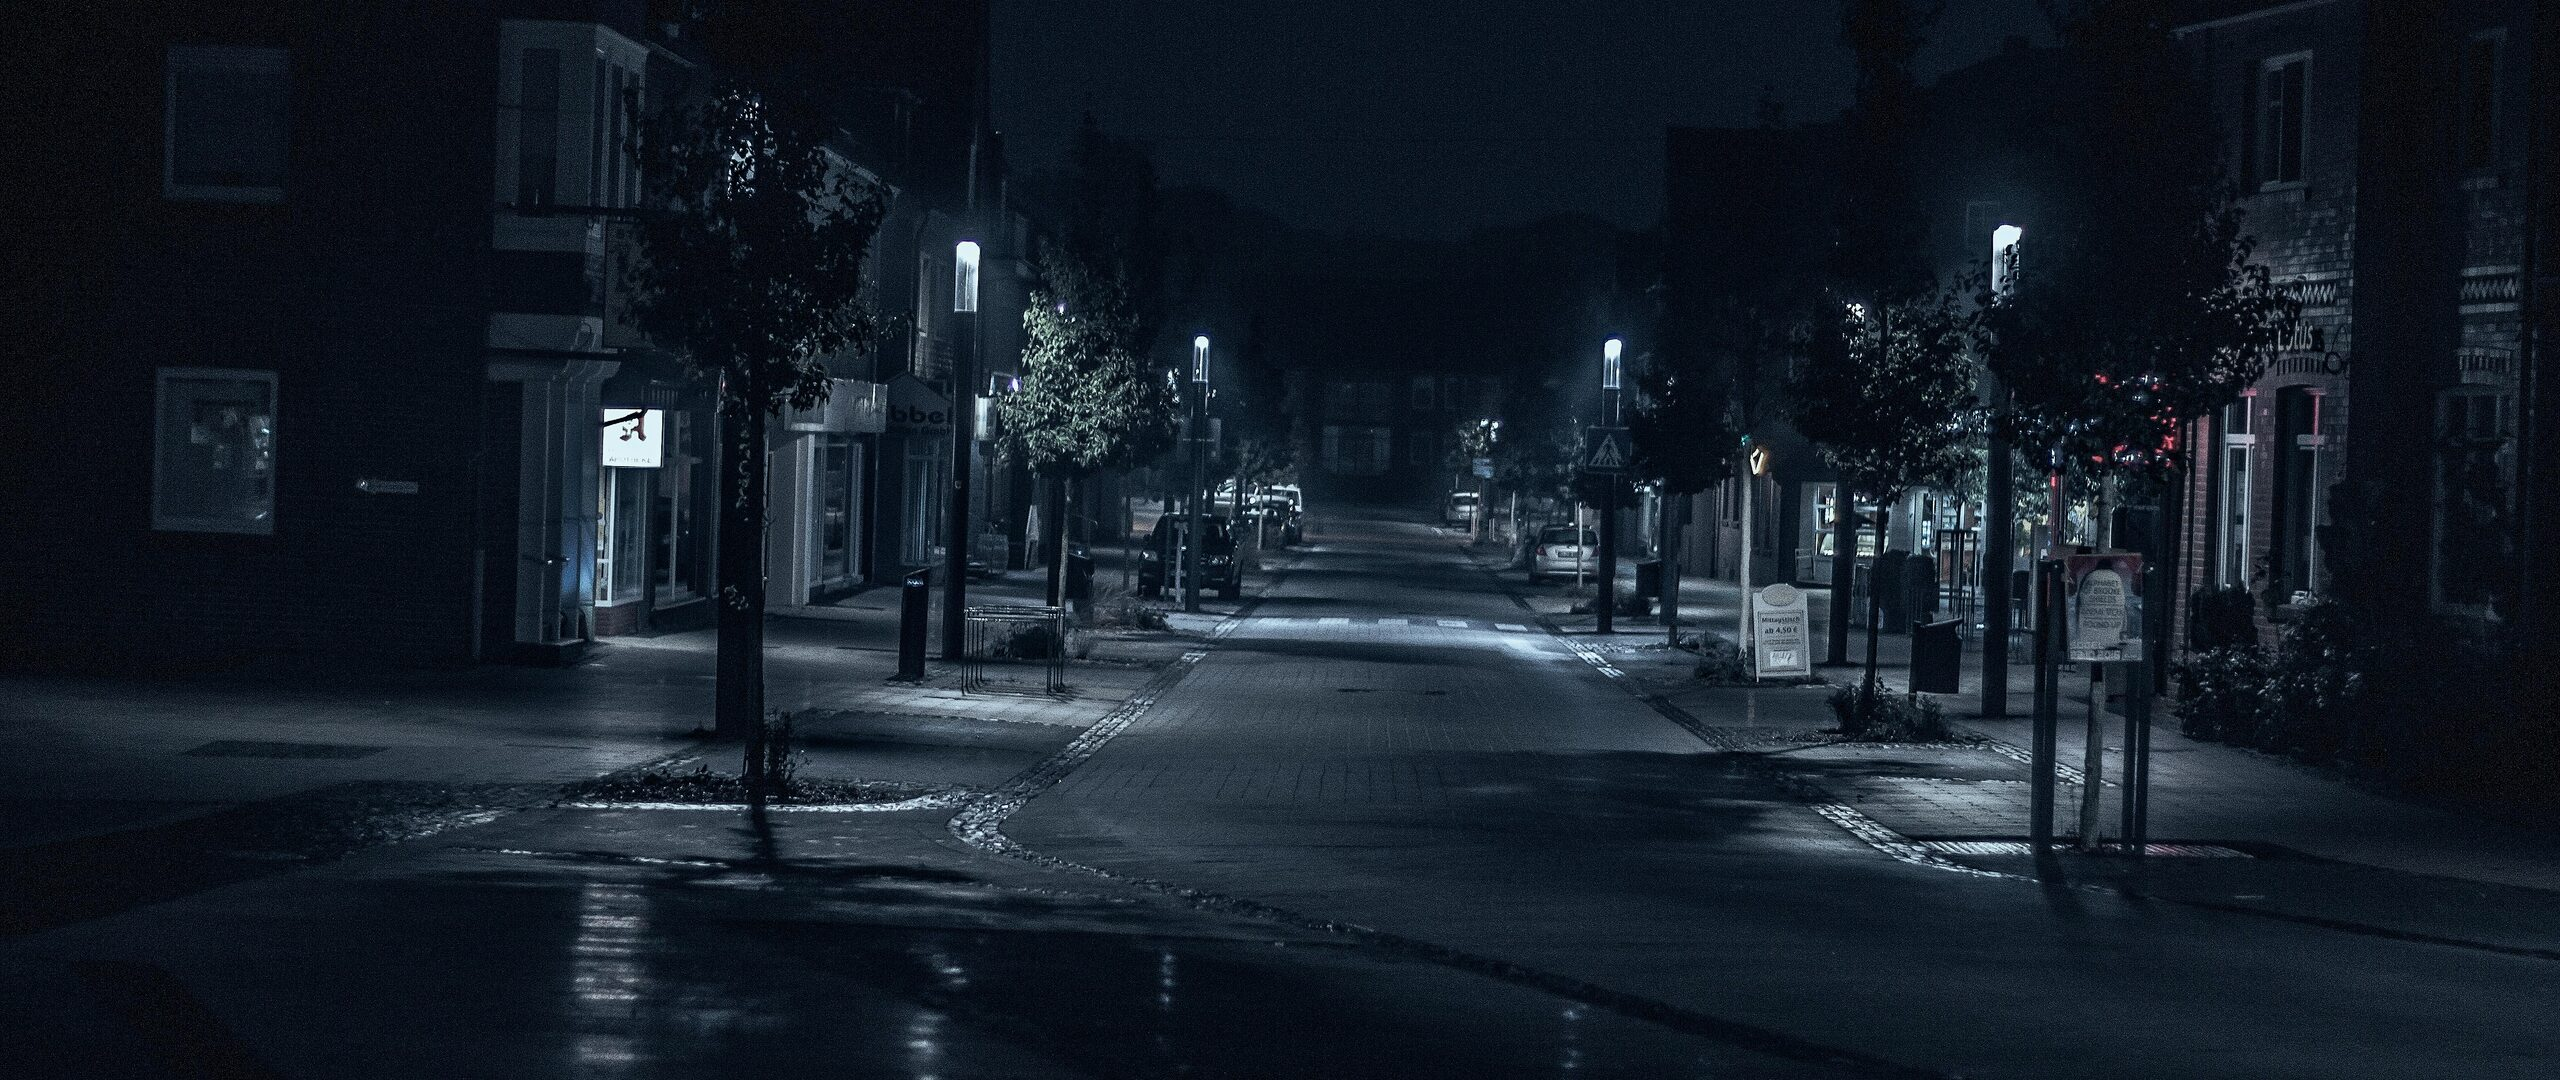 road-street-night-outdoors-cityscape-evening-5k-xj.jpg